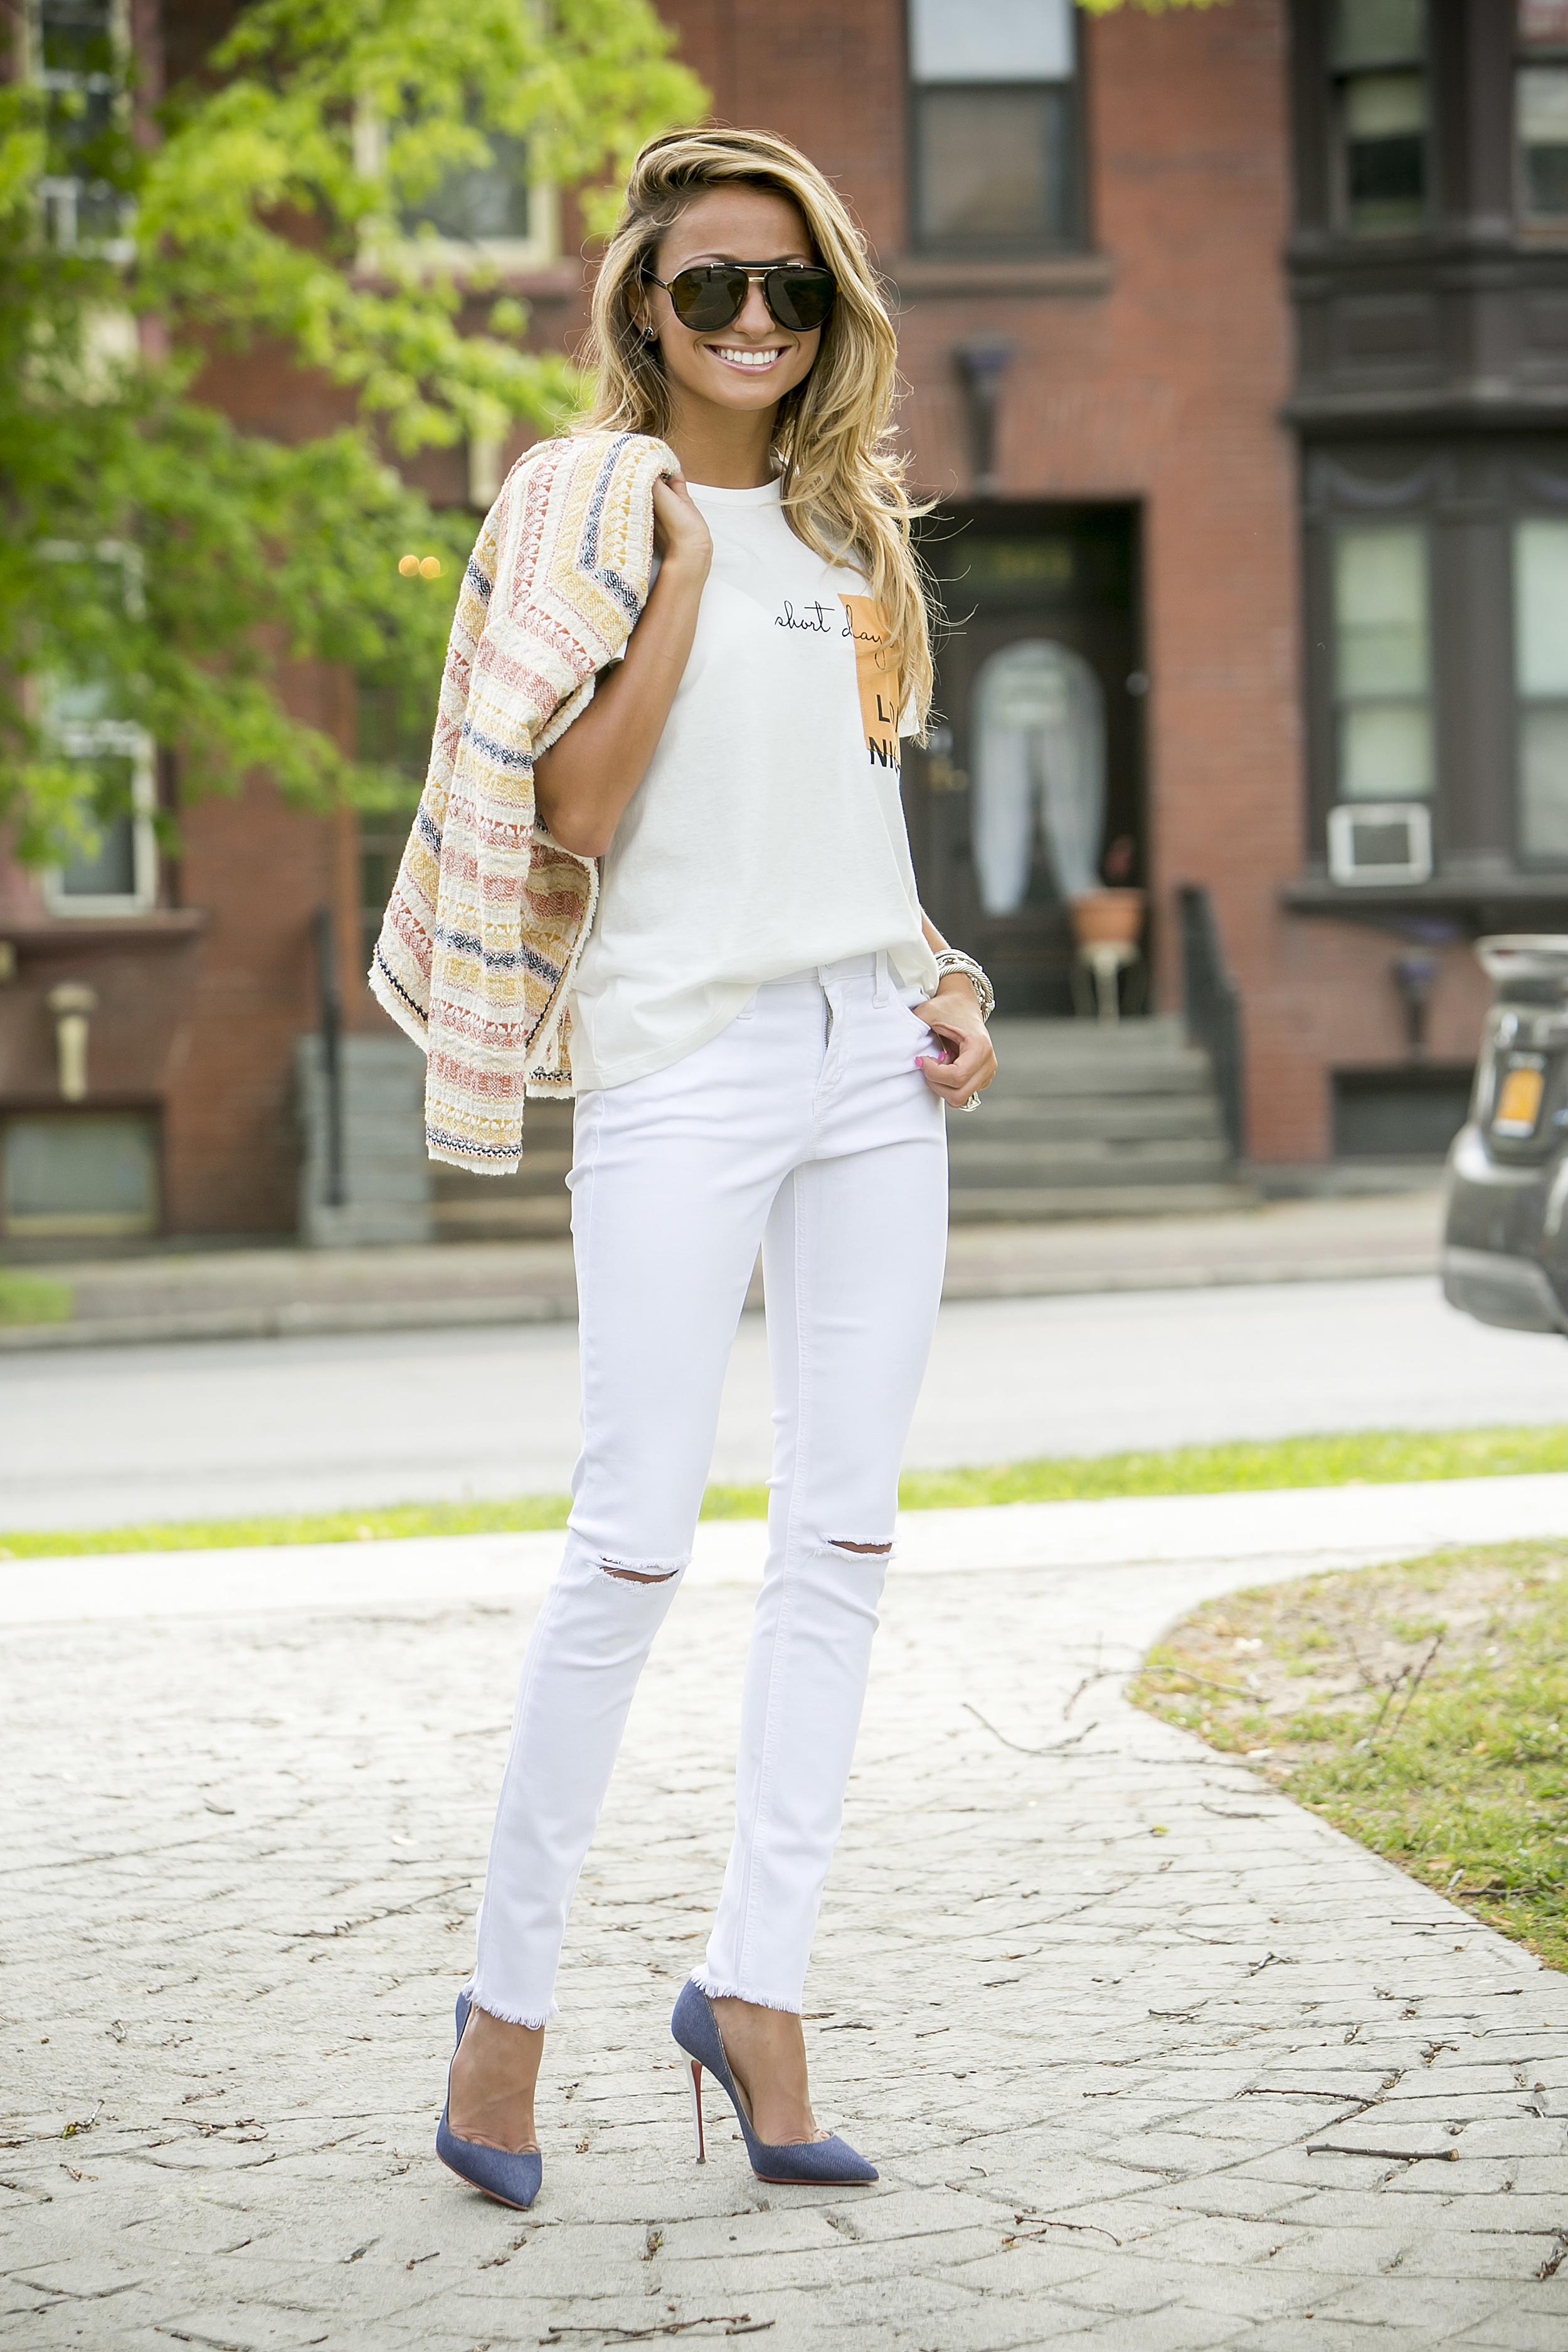 Tee:  Zara   Jacket:  Zara   Jeans:  Joe's Jeans   Pumps:  Christian Louboutin